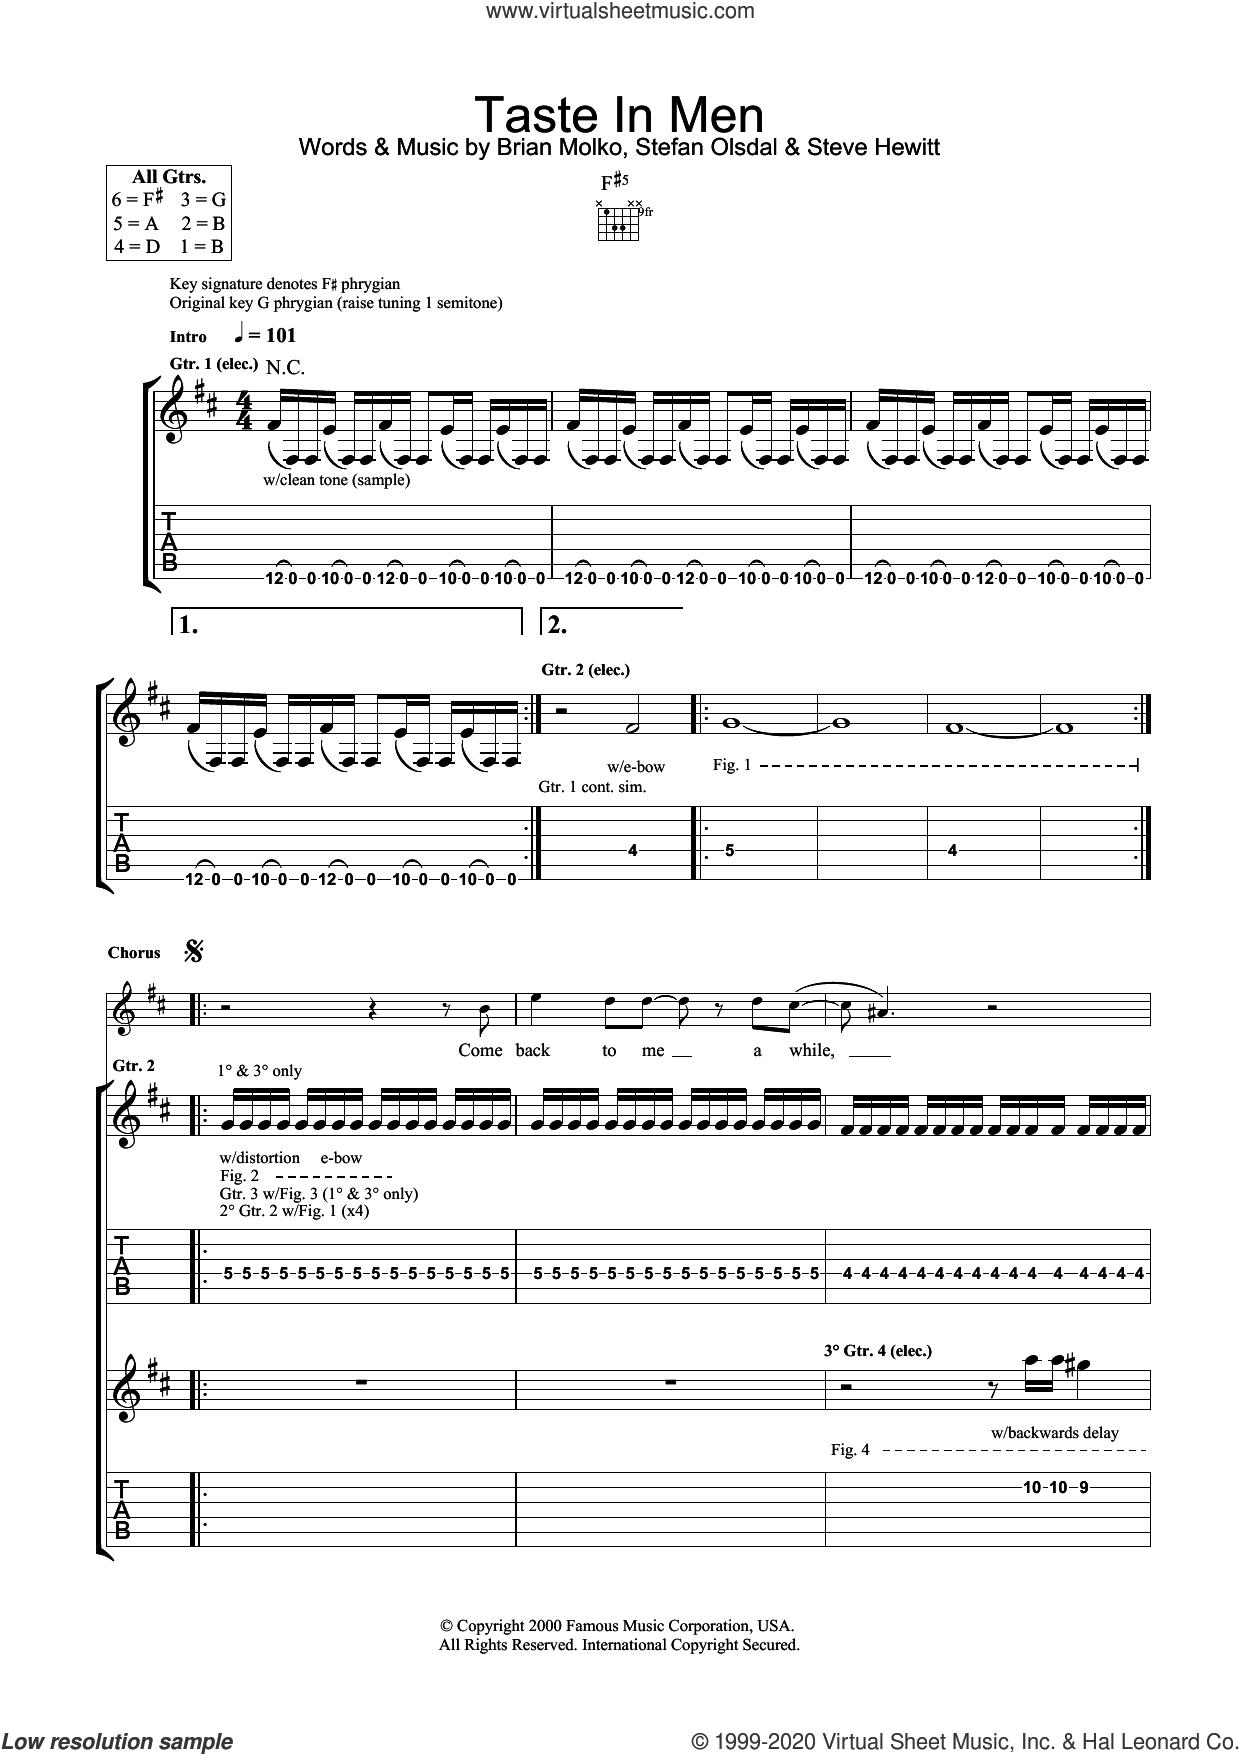 Taste In Men sheet music for guitar (tablature) by Placebo, Brian Molko, Stefan Olsdal and Steve Hewitt, intermediate skill level